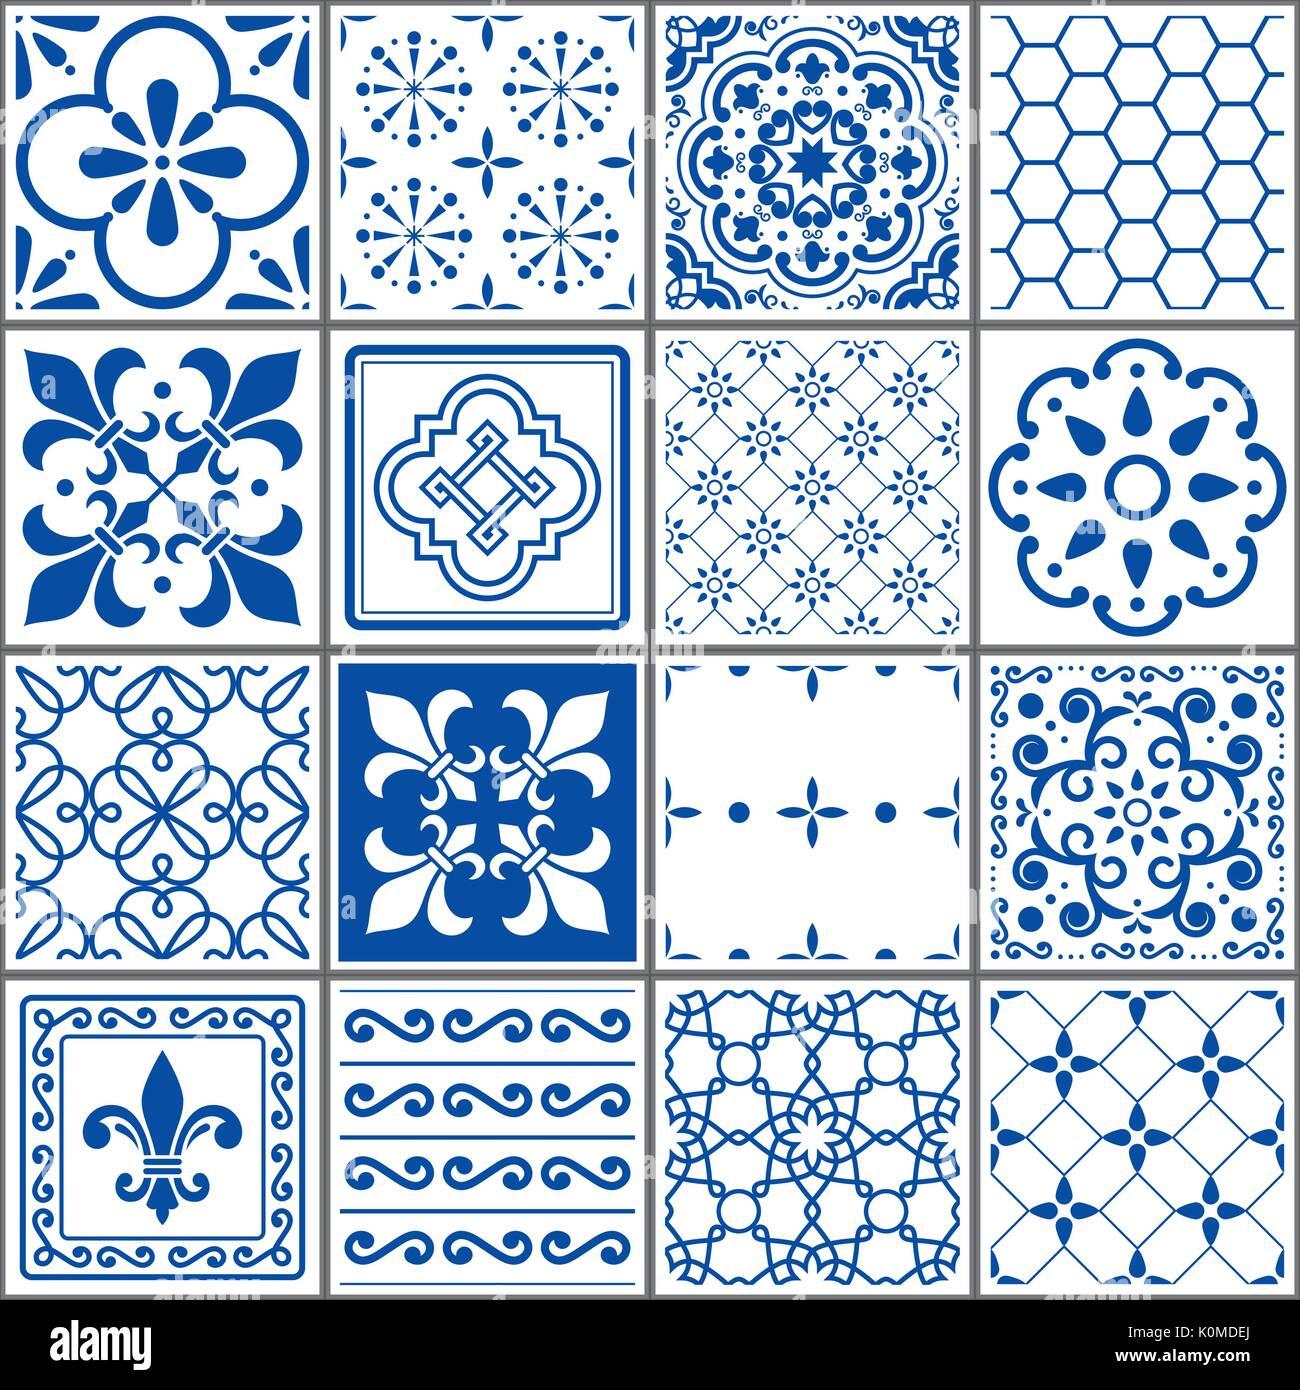 Patrn de azulejos portugueses Lisboa perfecta azul ndigo baldosas